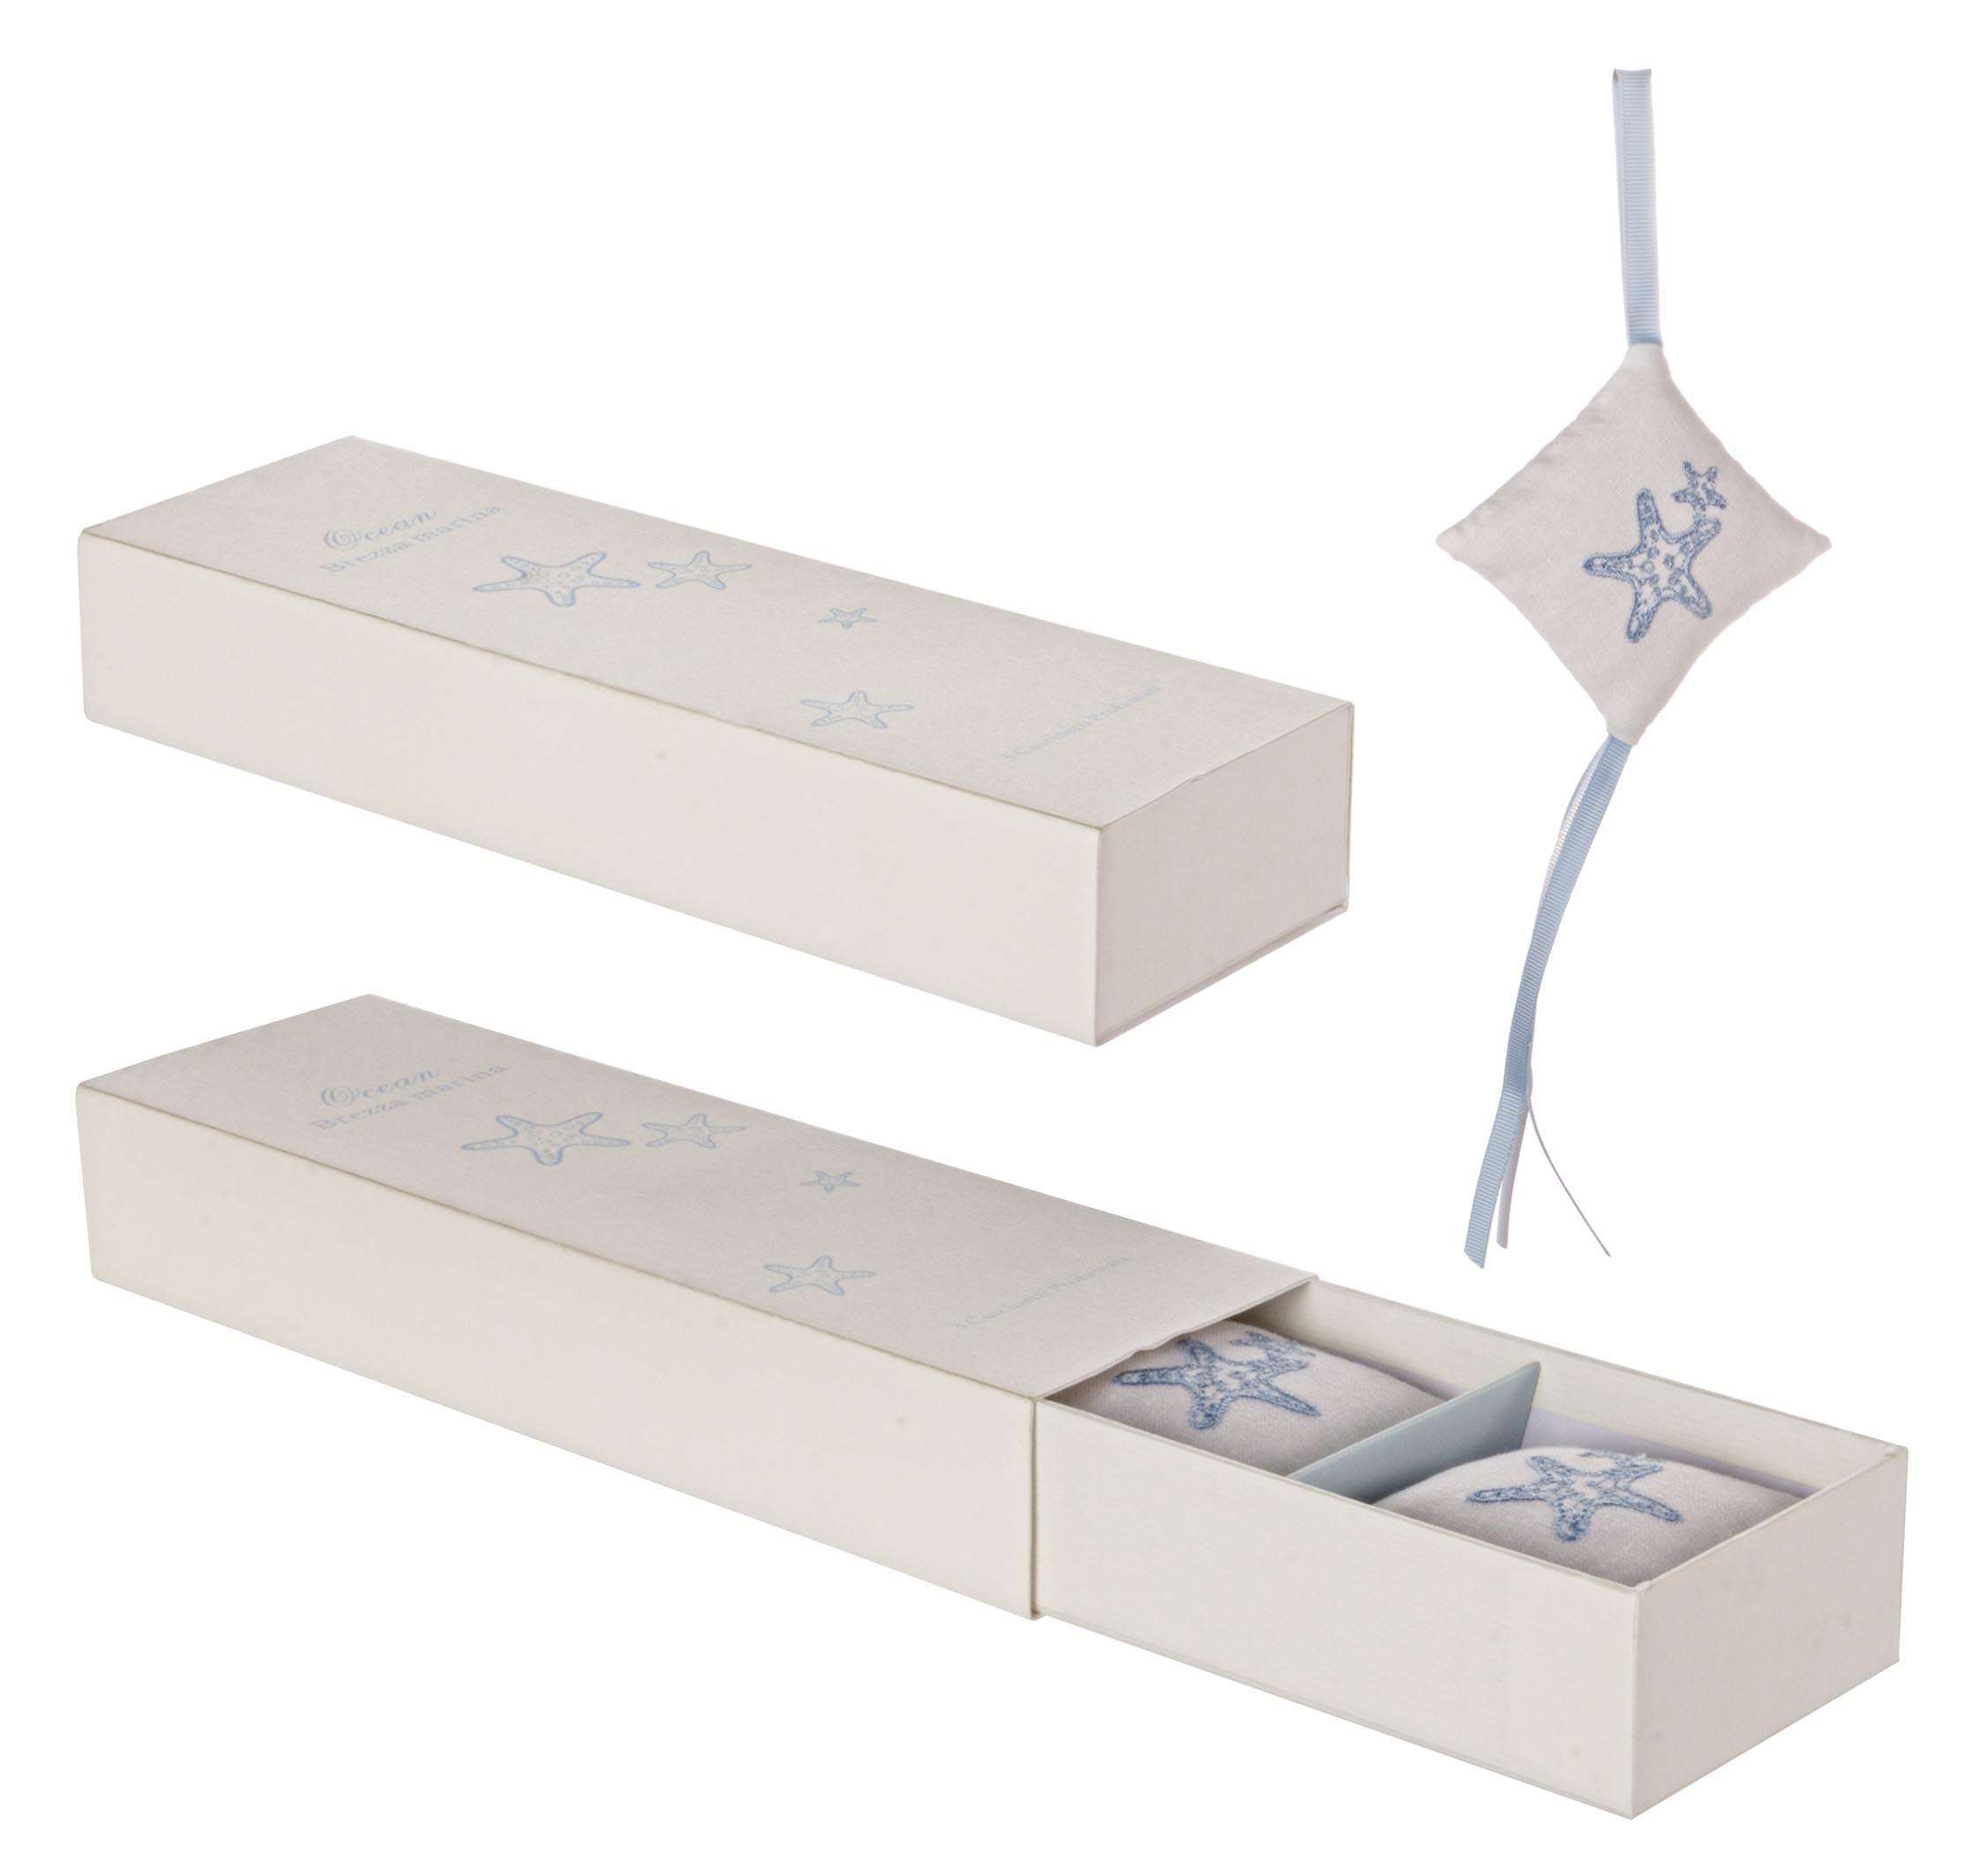 Set 3 saculeti parfumati si cutie cadou Ocean Alb / Albastru, L26xl8,5xH4,5 cm imagine